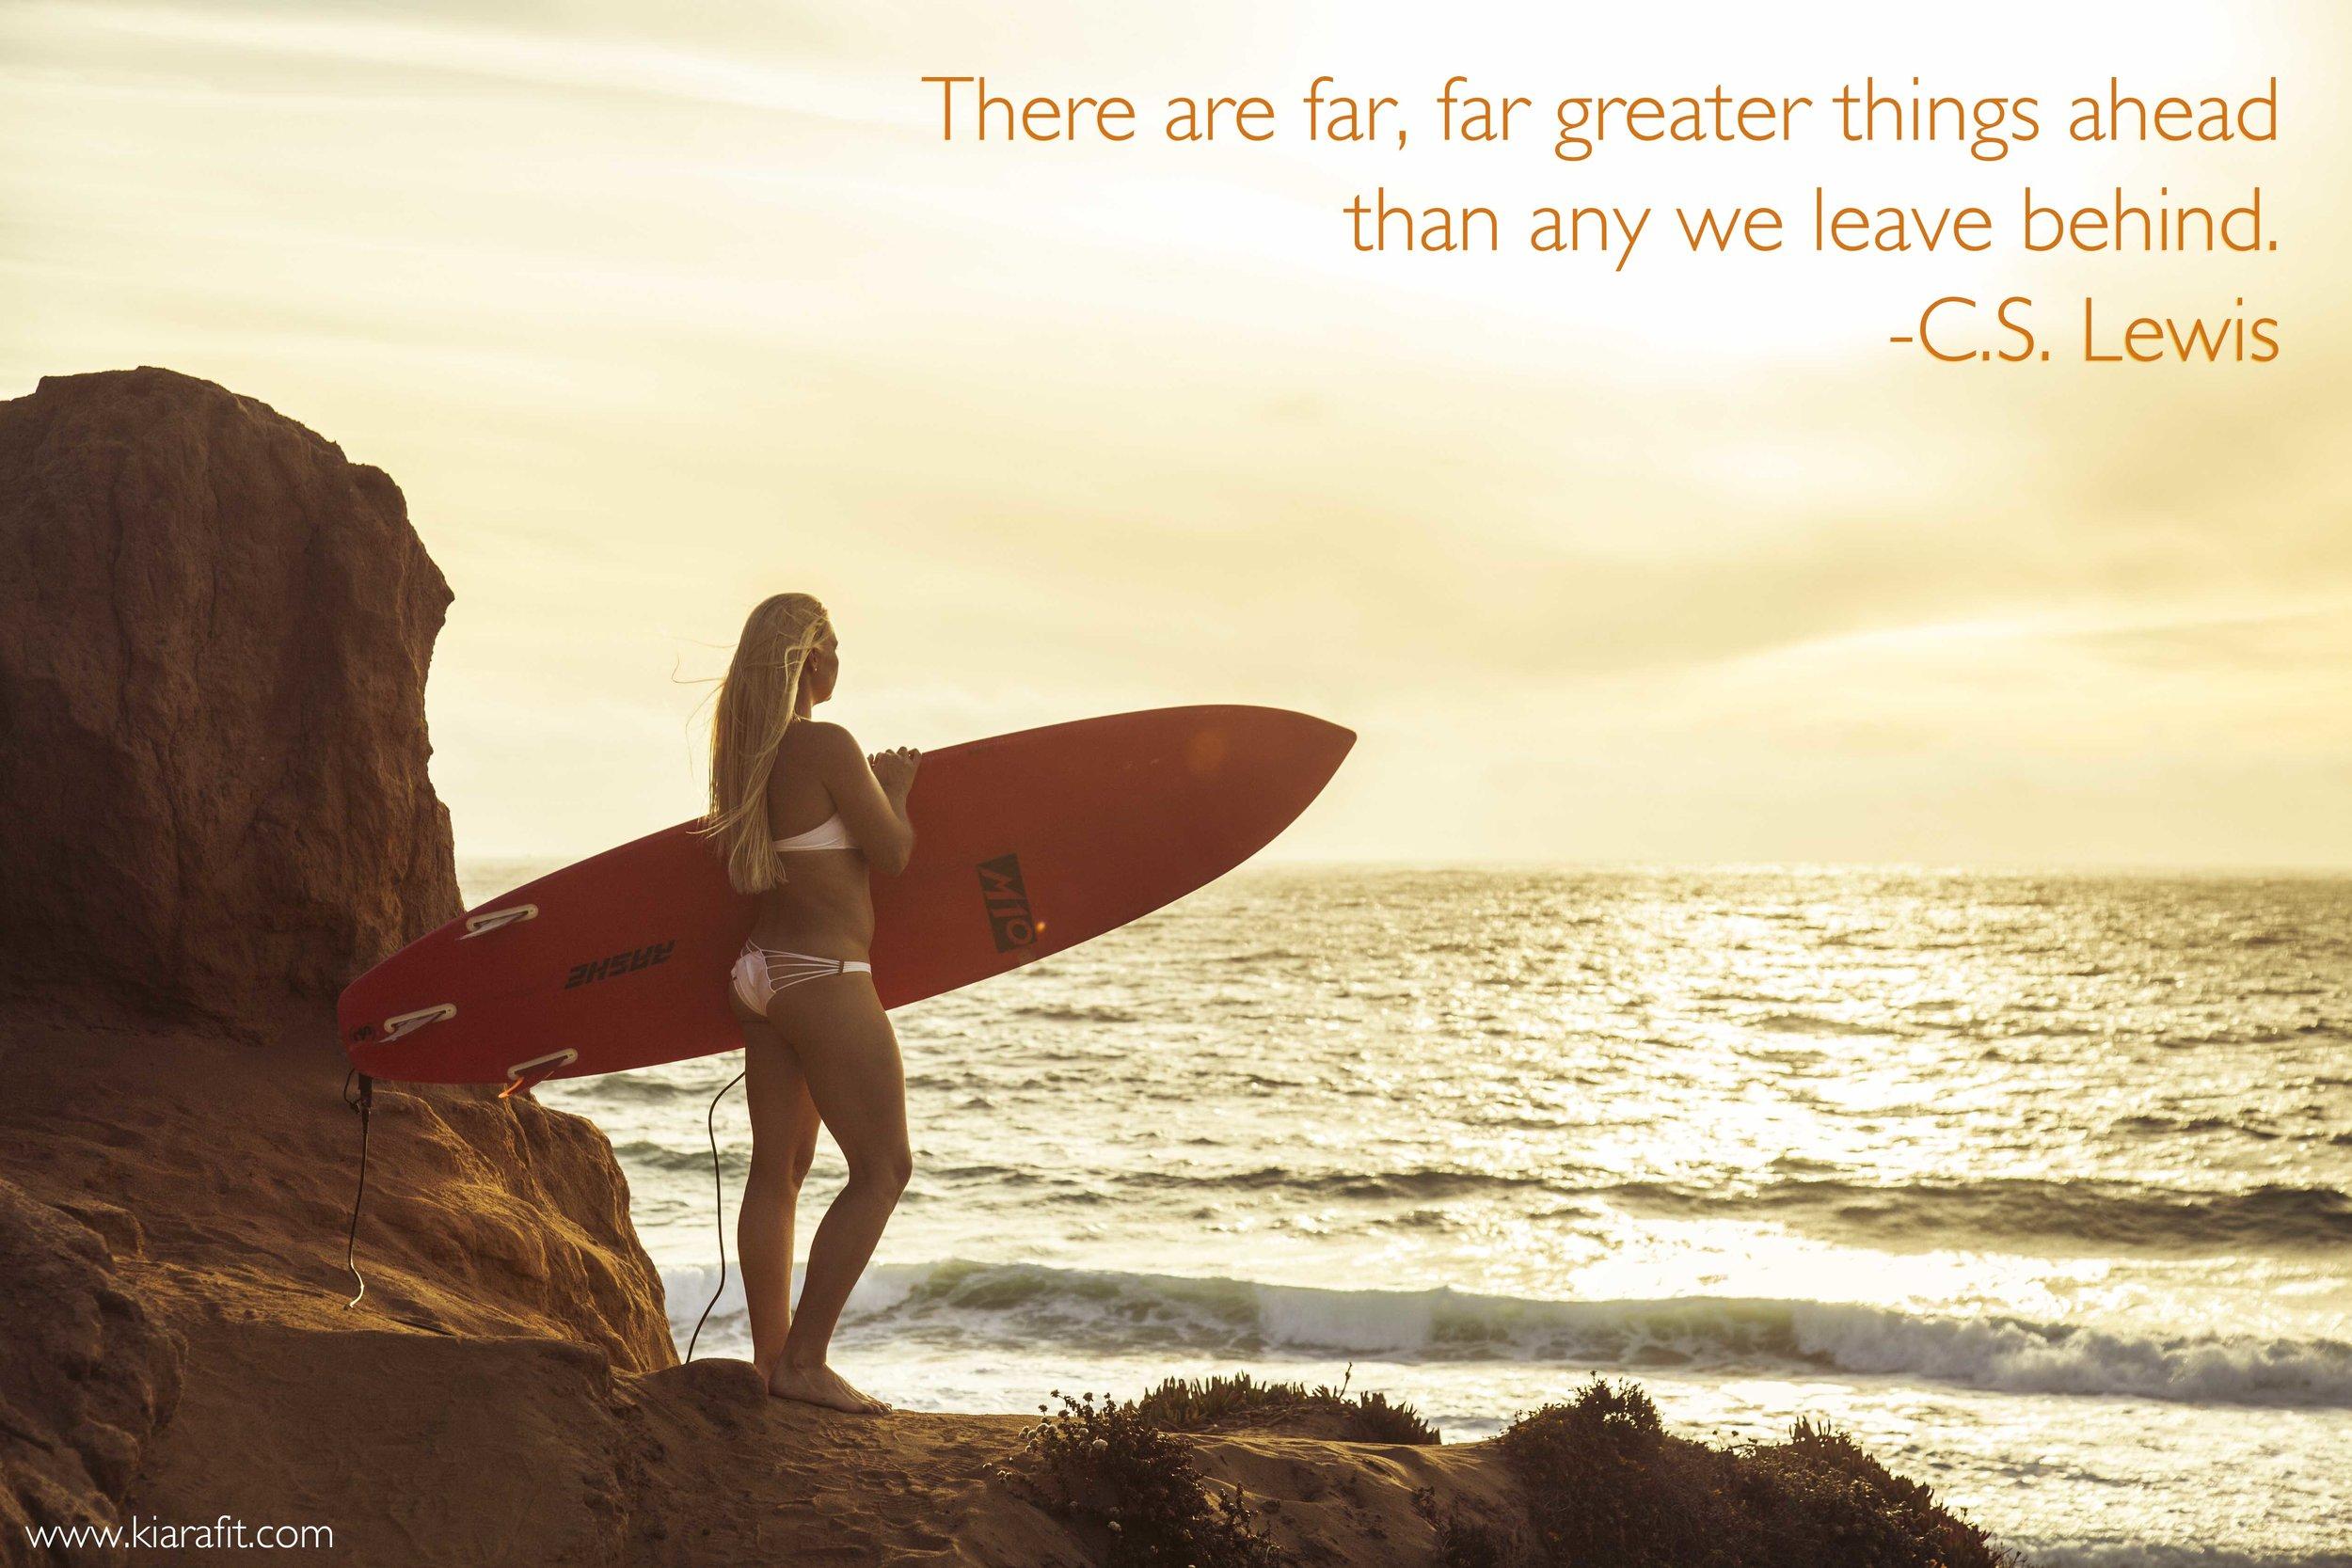 greater things ahead